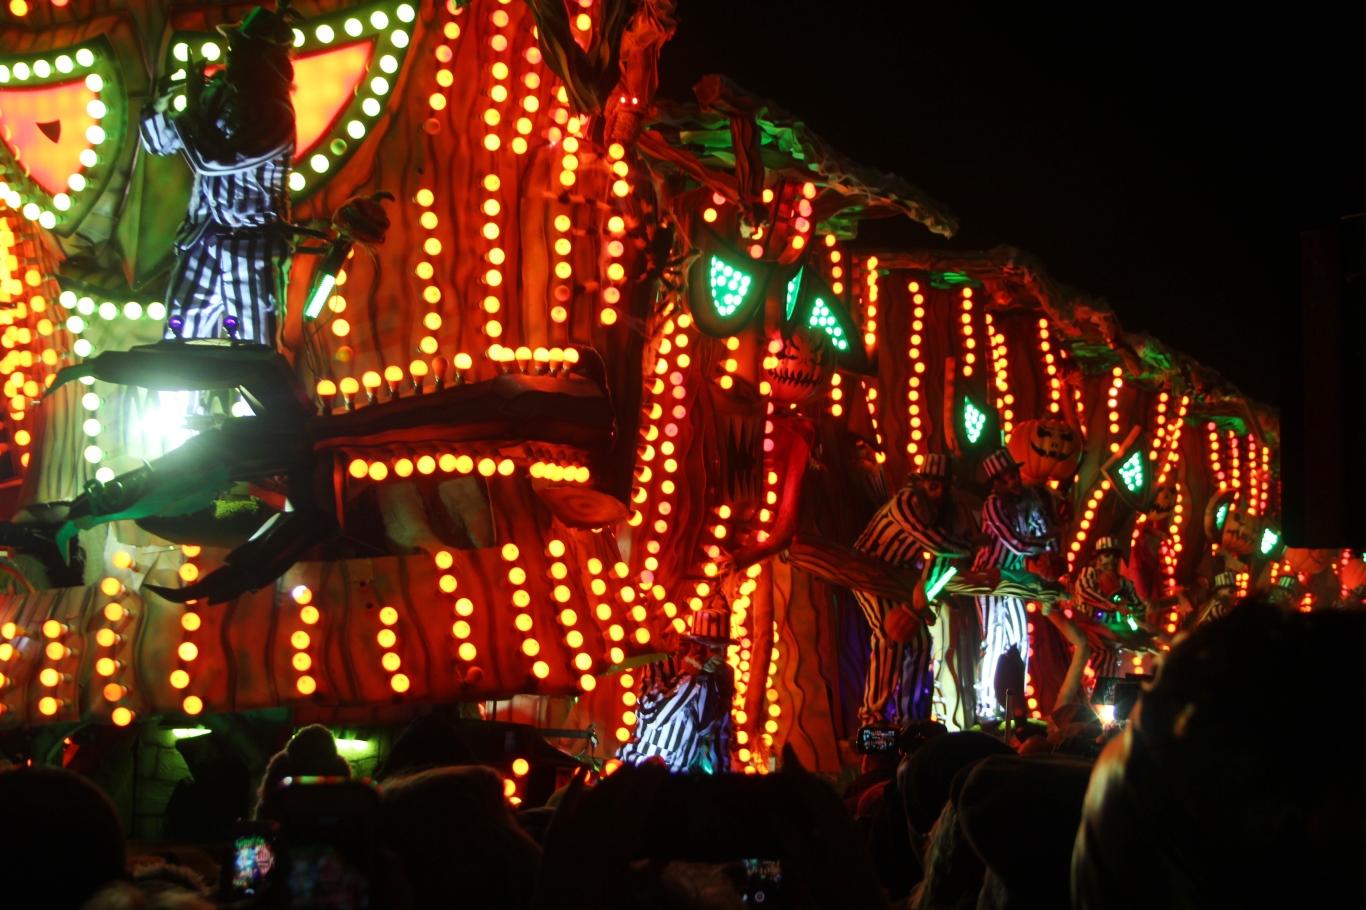 file:bridgwater carnival 2017 - ramblers cc (halloween in deadman's